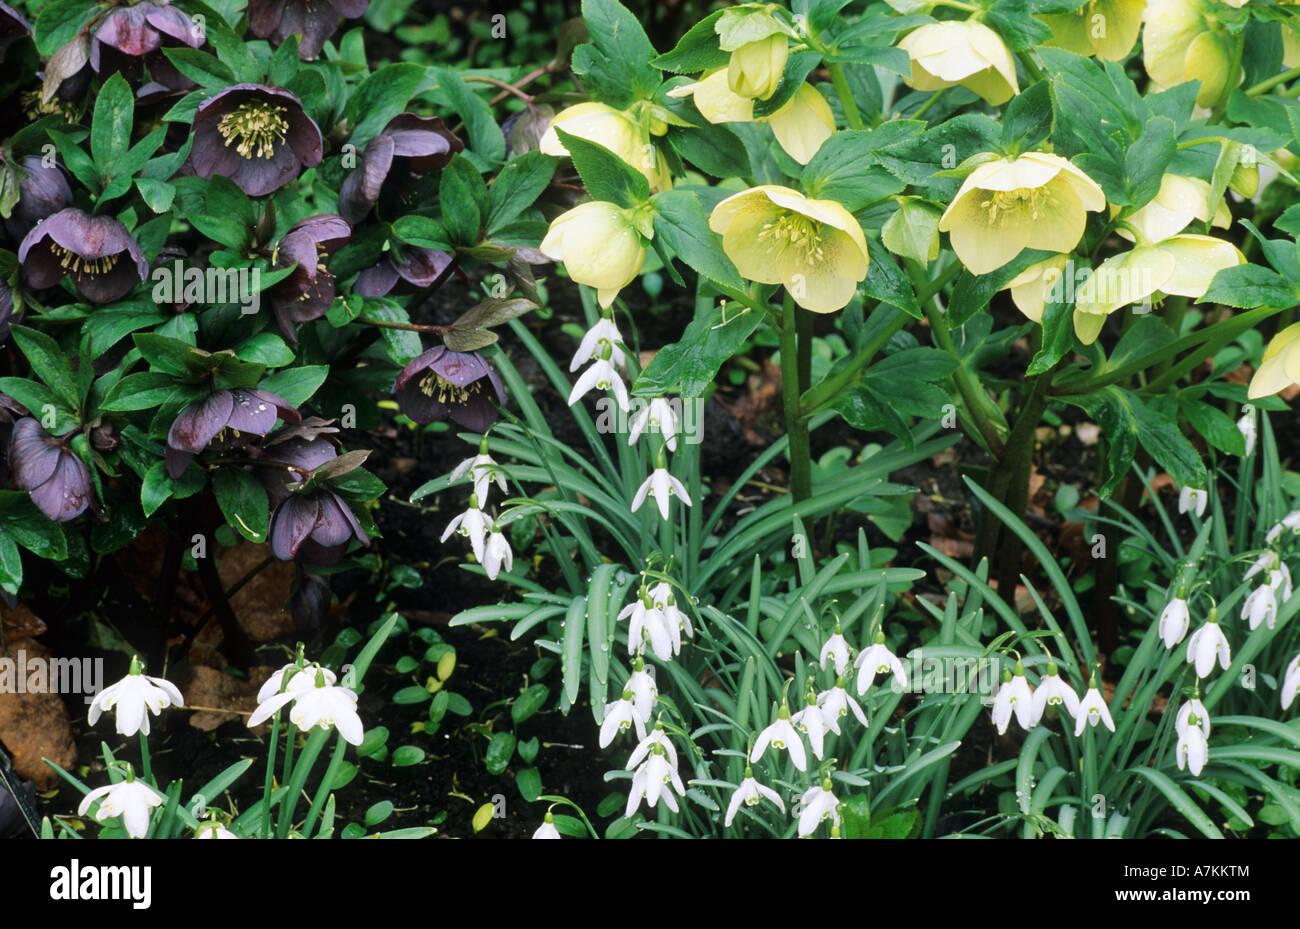 Helleborus Orientalis Primrose And Blue Black Snowdrops Containers